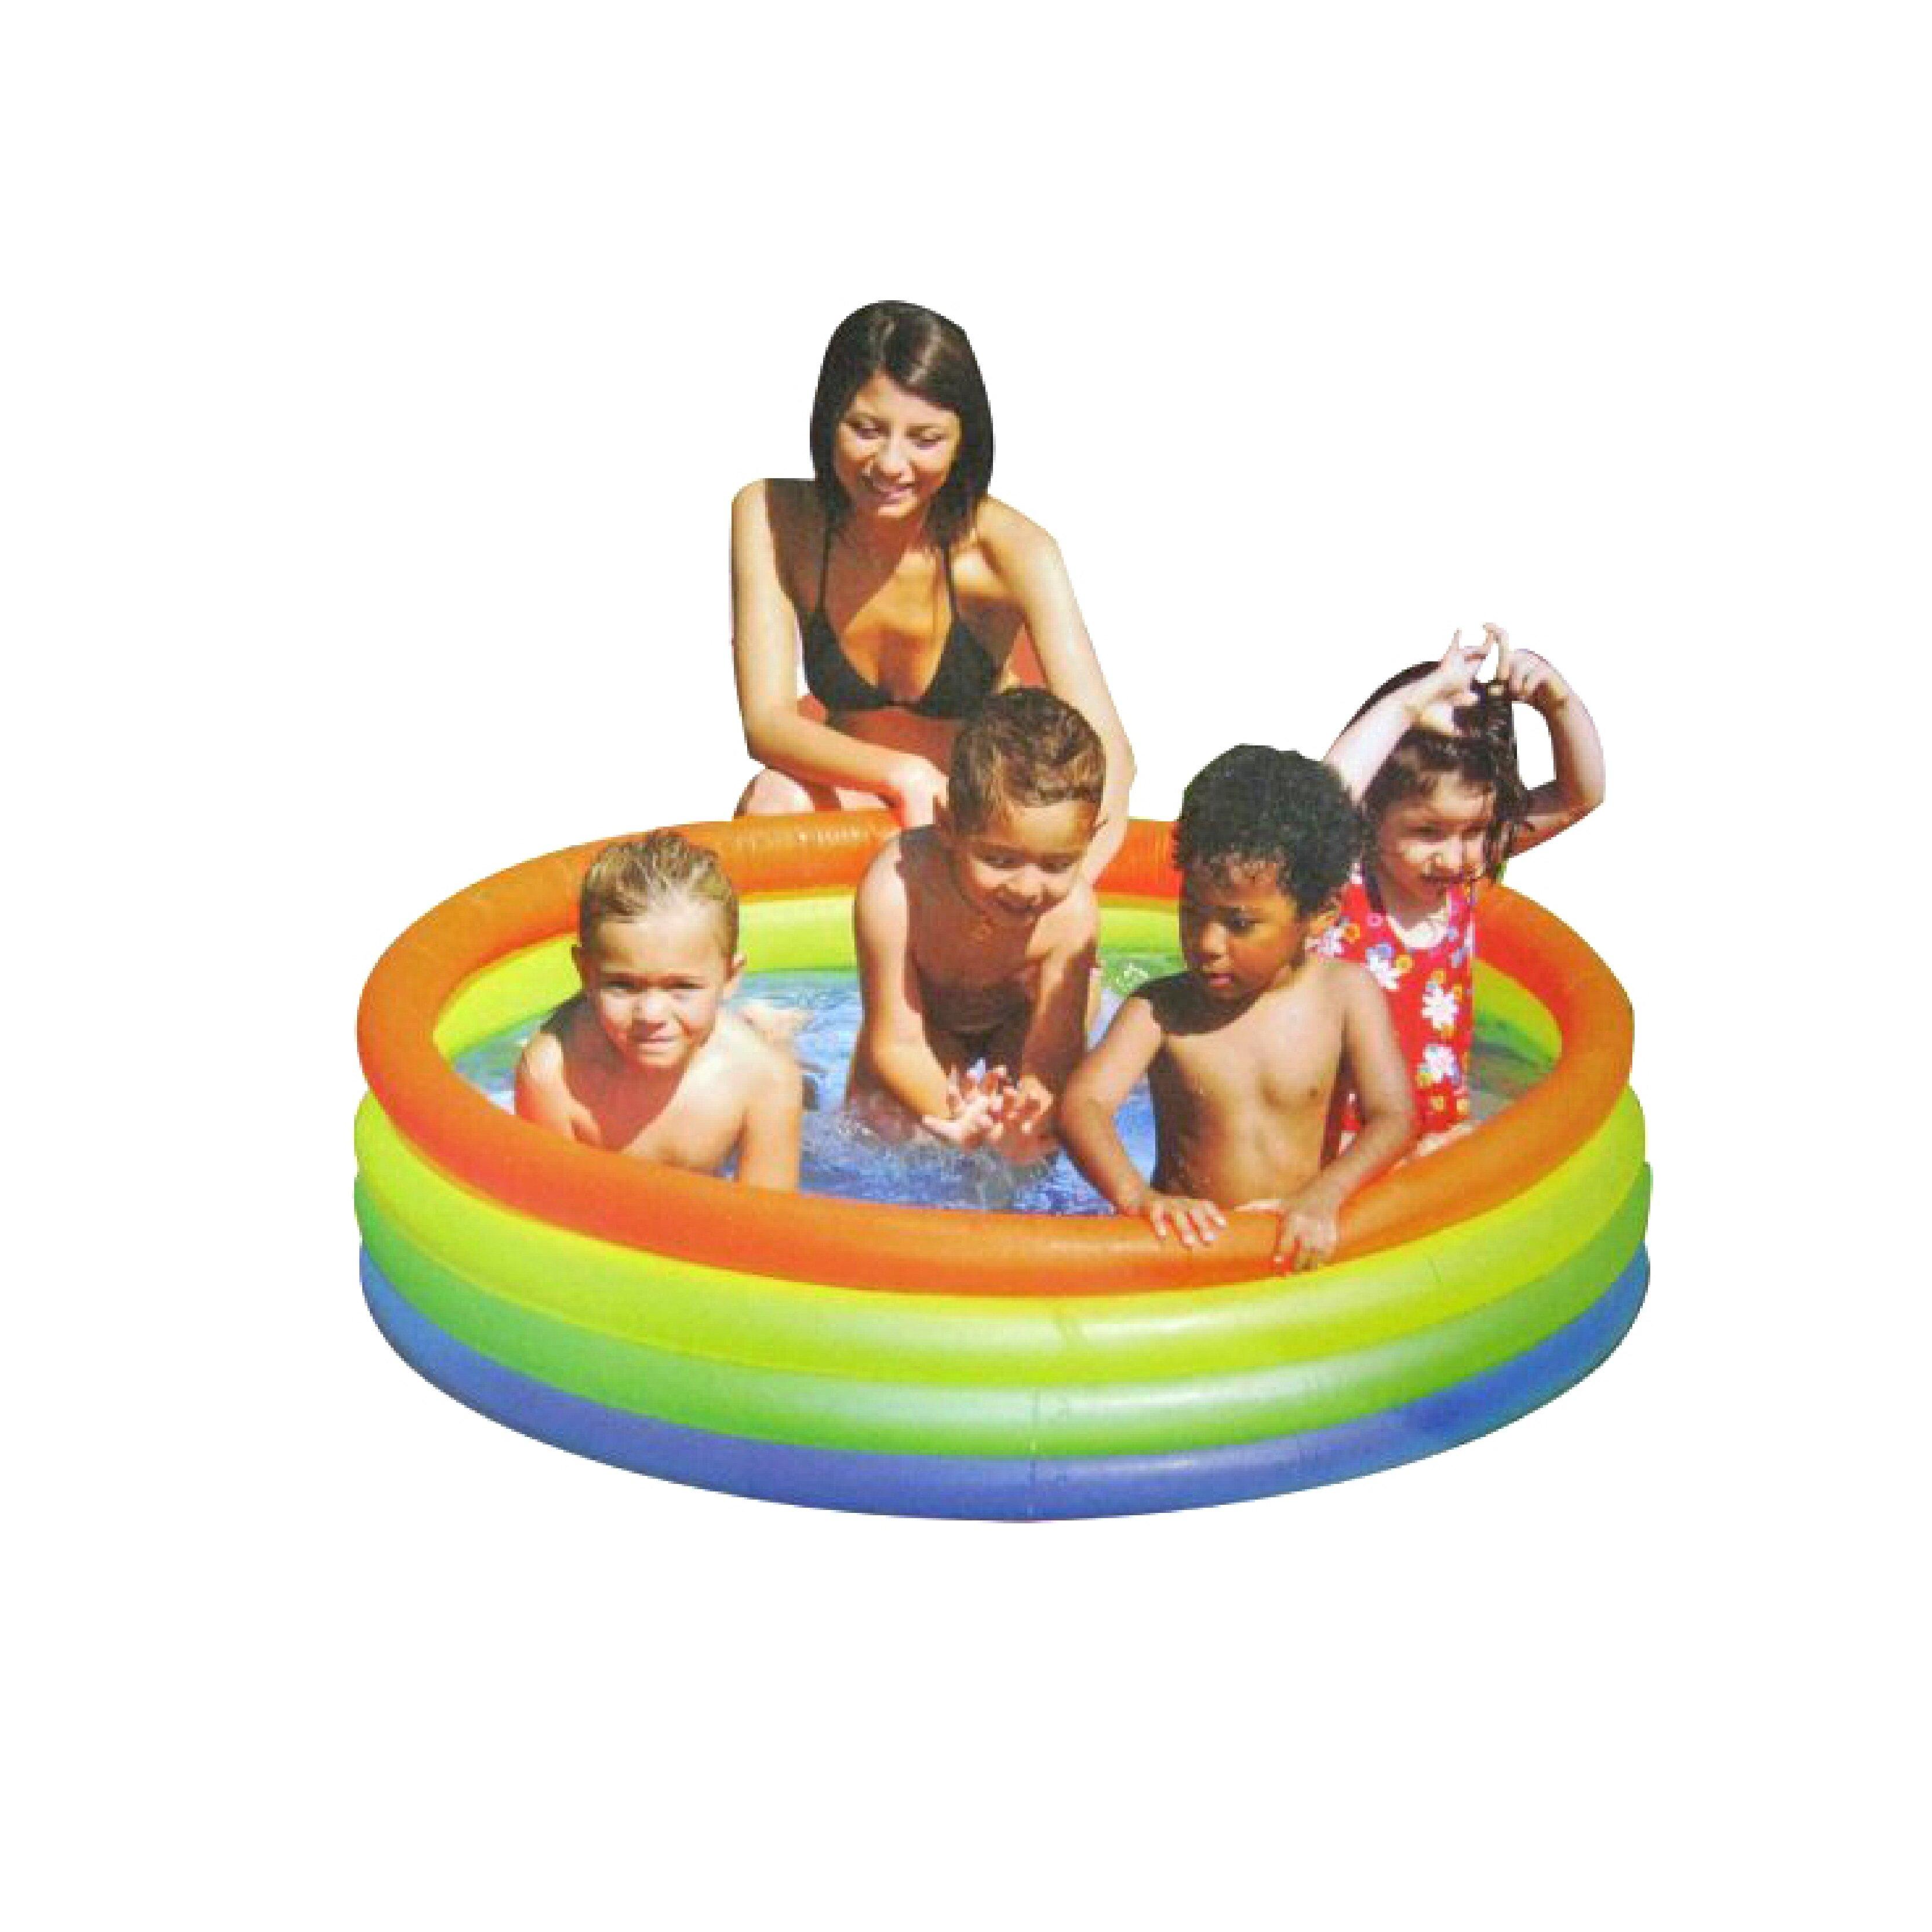 【TreeWalker 露遊】090064四層彩色泳池遊戲池 戲水池 游泳池 流線型設計~無毒環保材質 386L容量